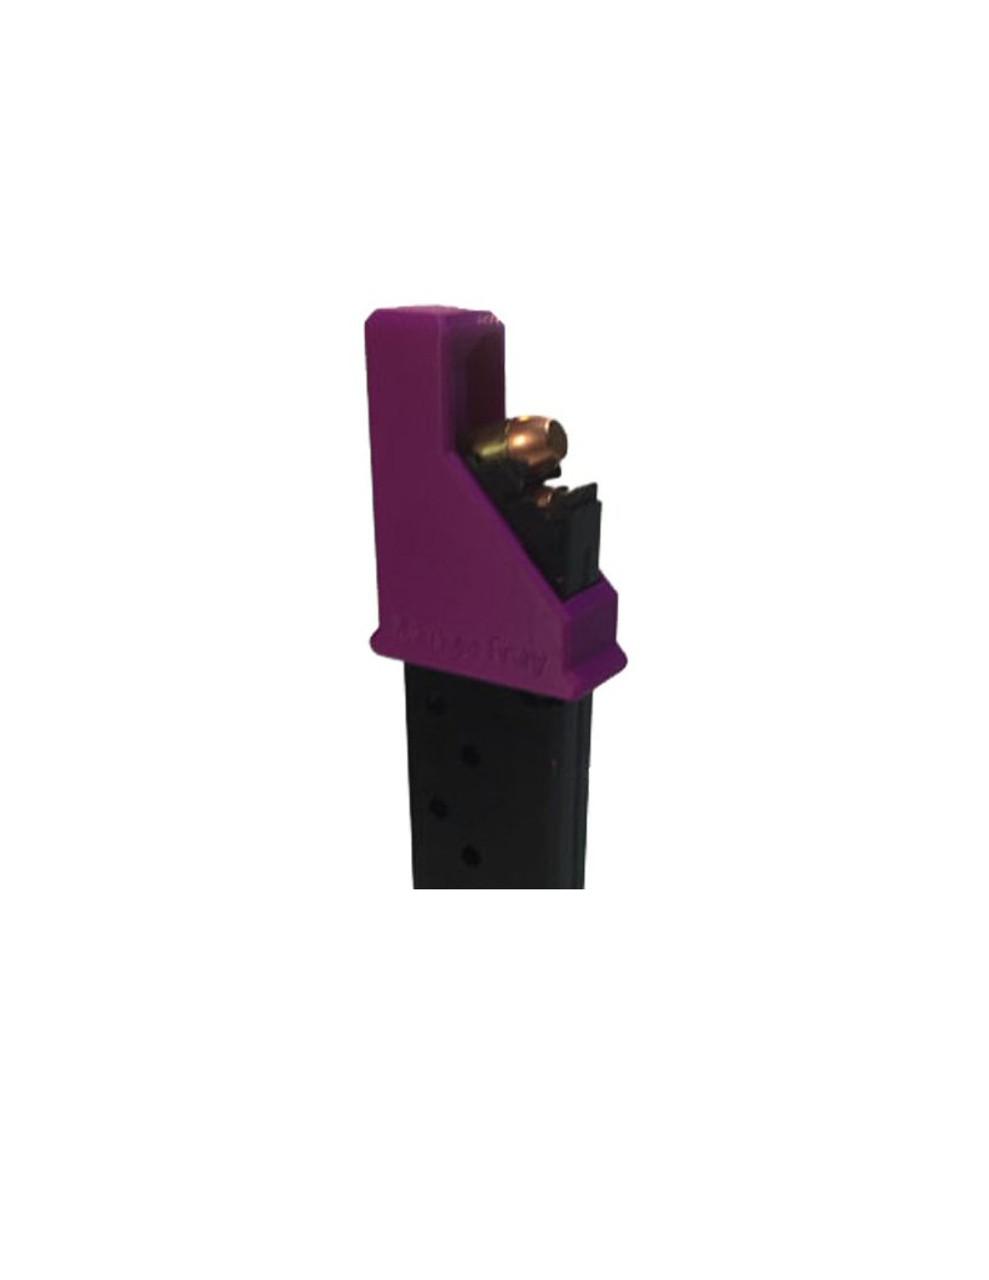 RangeTray Magazine Loader SpeedLoader for Remington RM380 RM 380 .380 ORANGE